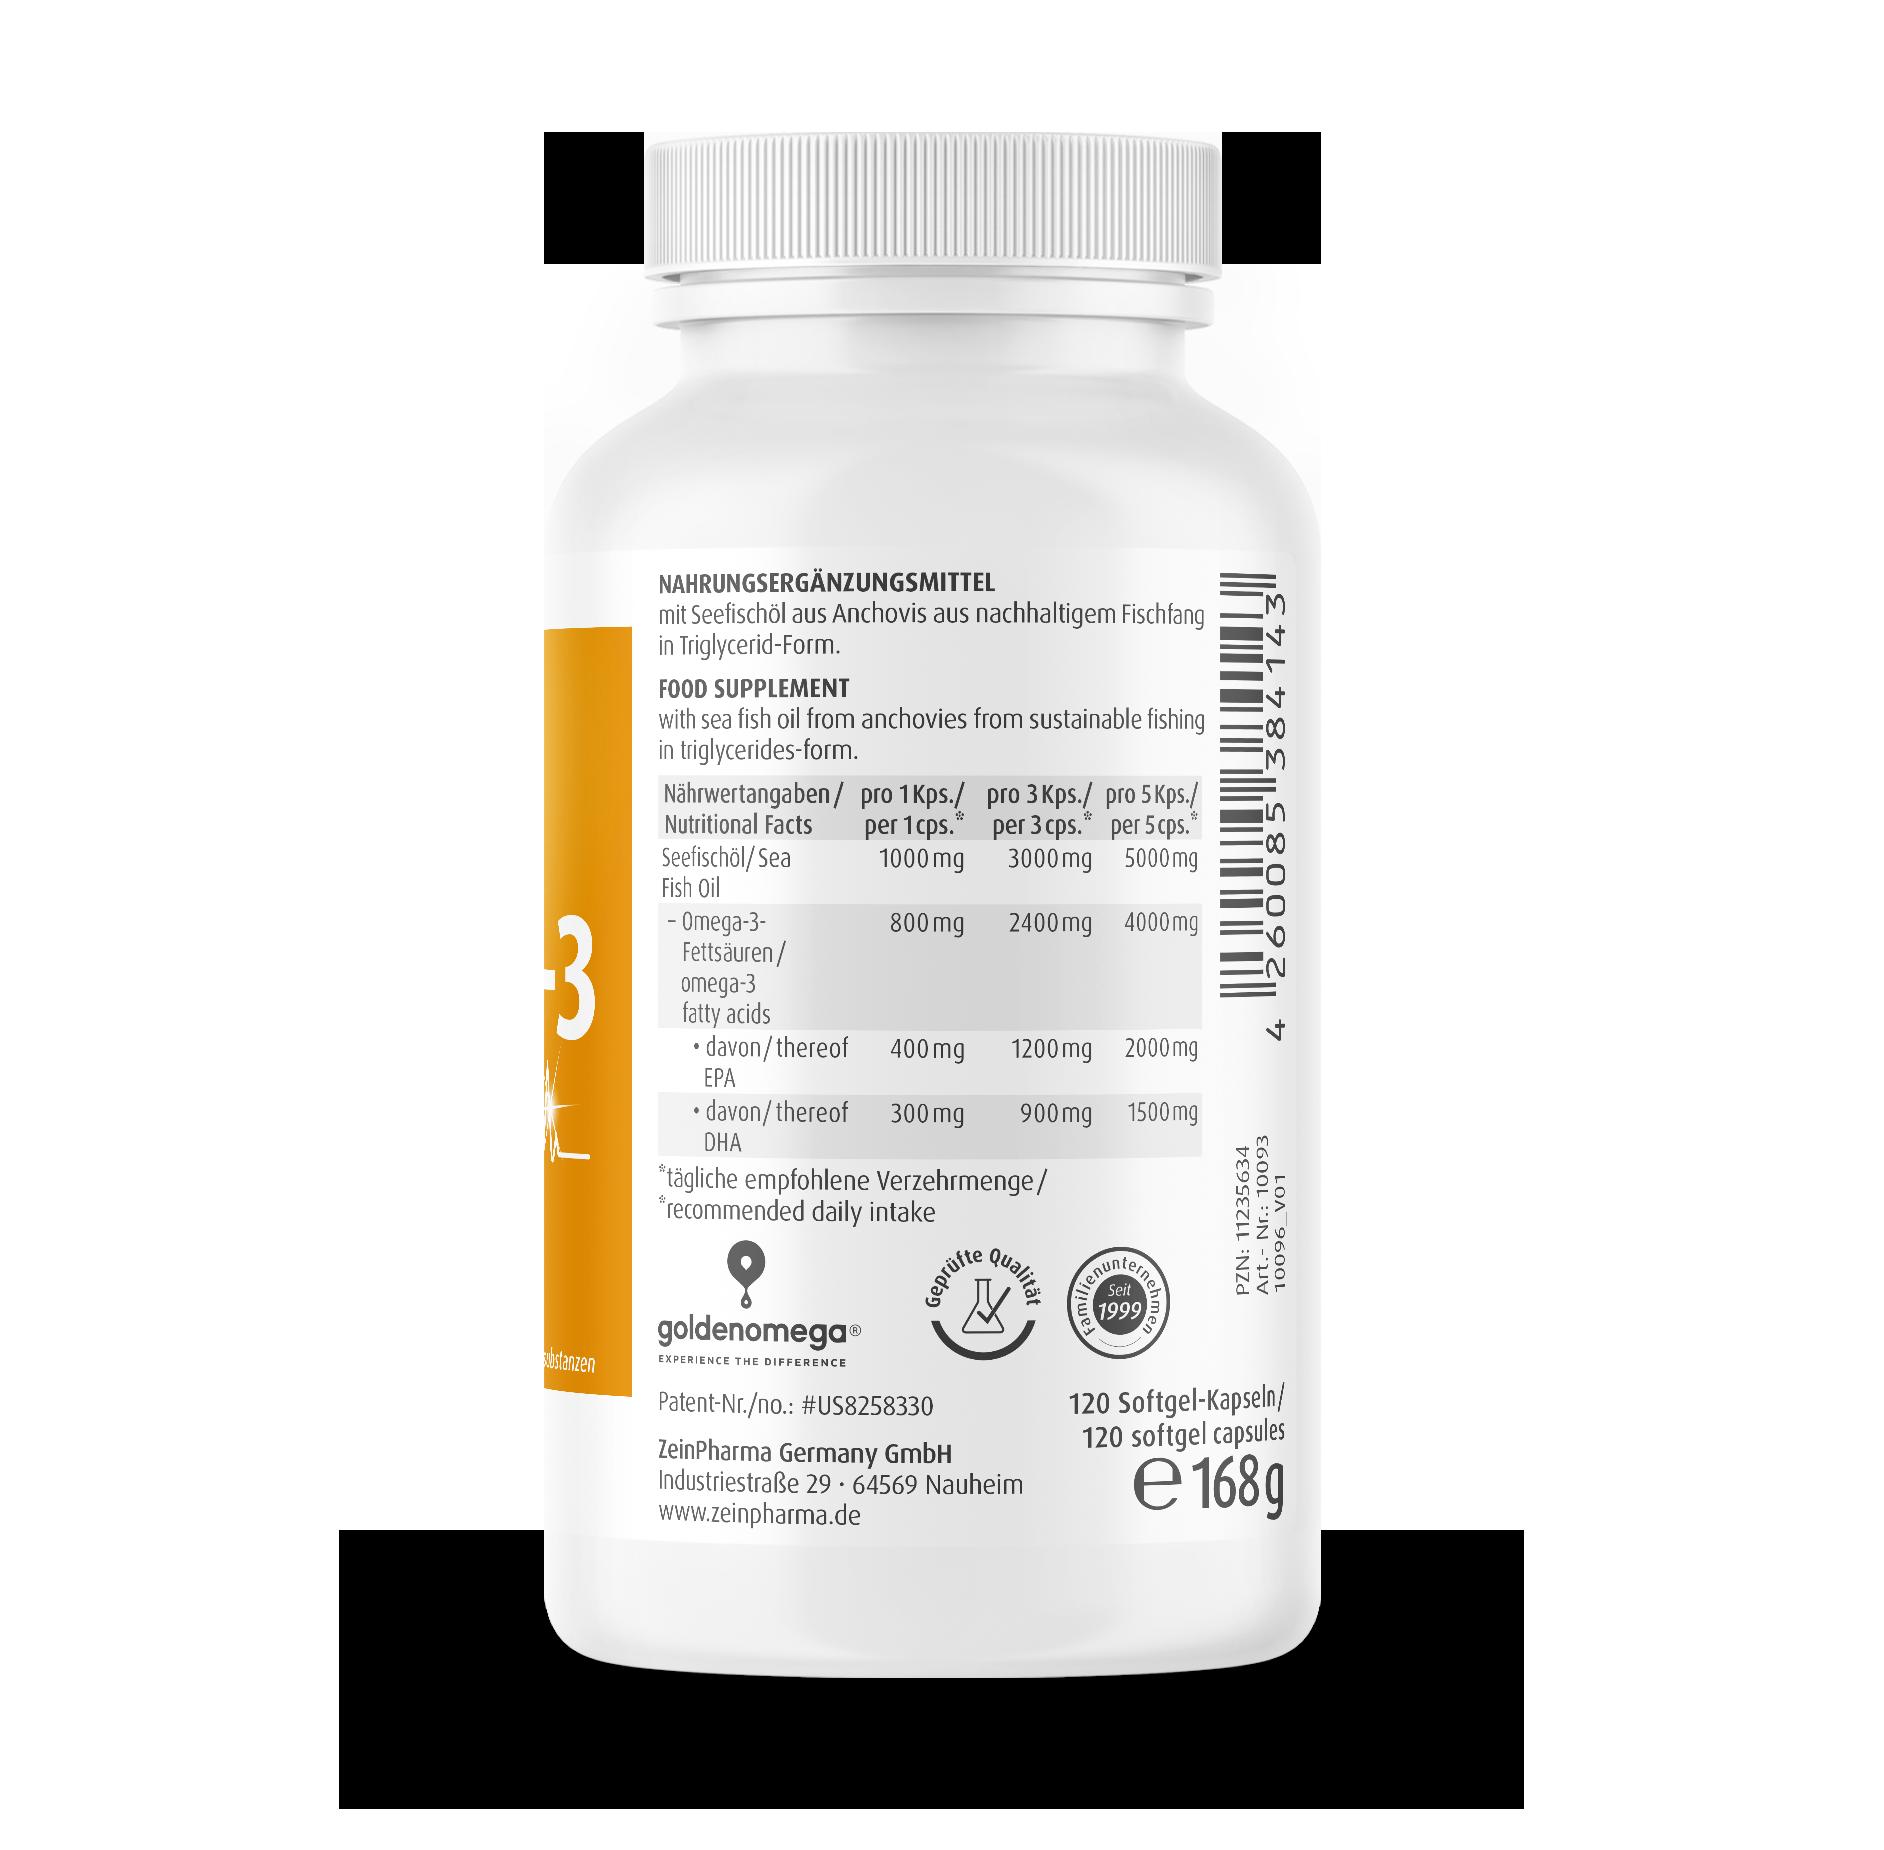 Omega-3 Gold Kapseln - Cardio Edition